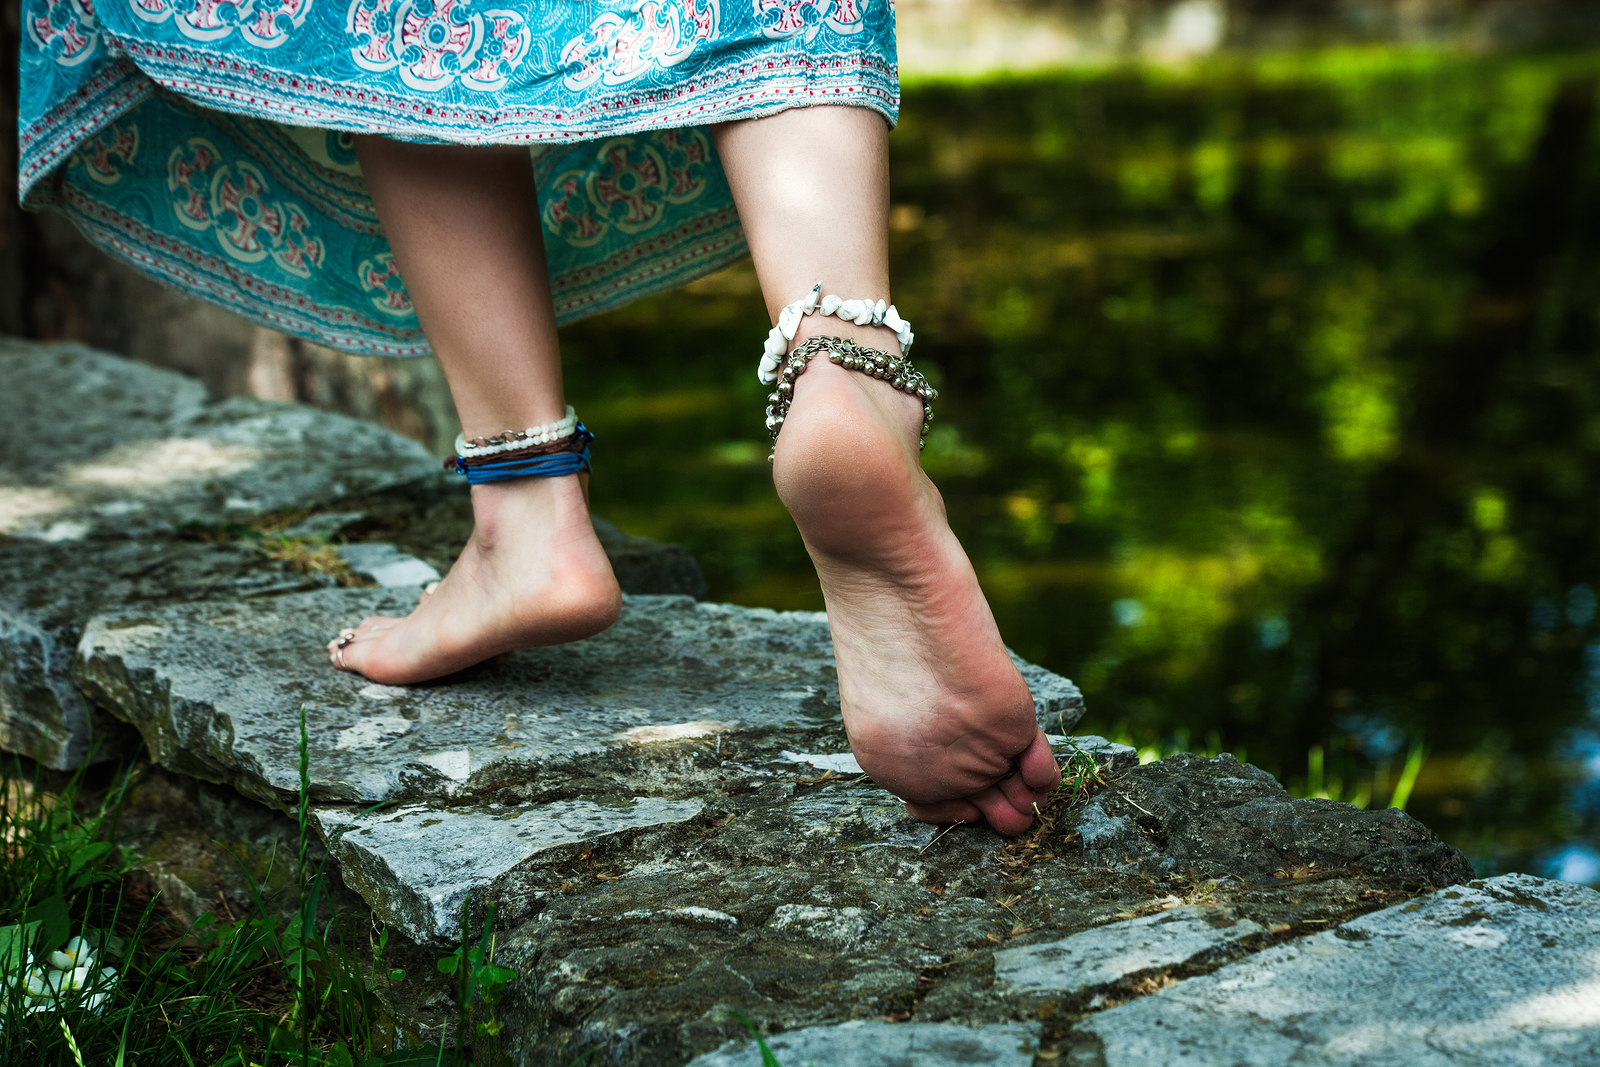 bigstock-barefoot-woman-walk-summer-bo-244158778.jpg